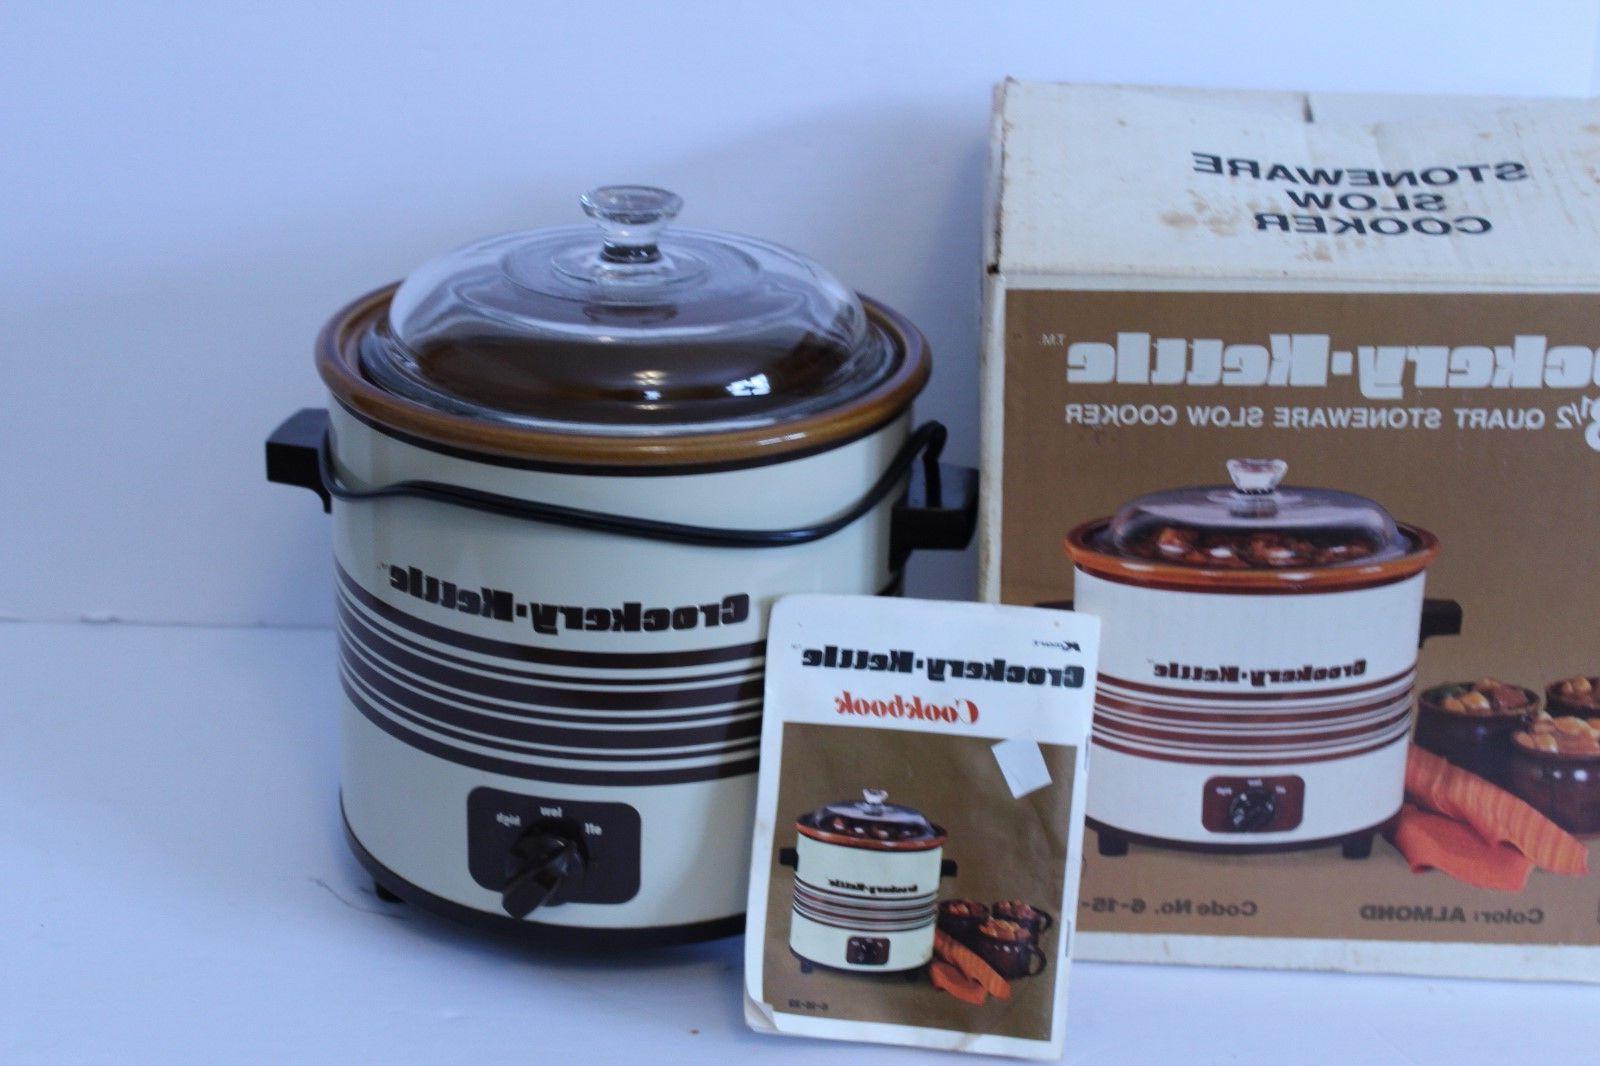 vintage crockery kettle slow cooker crock pot